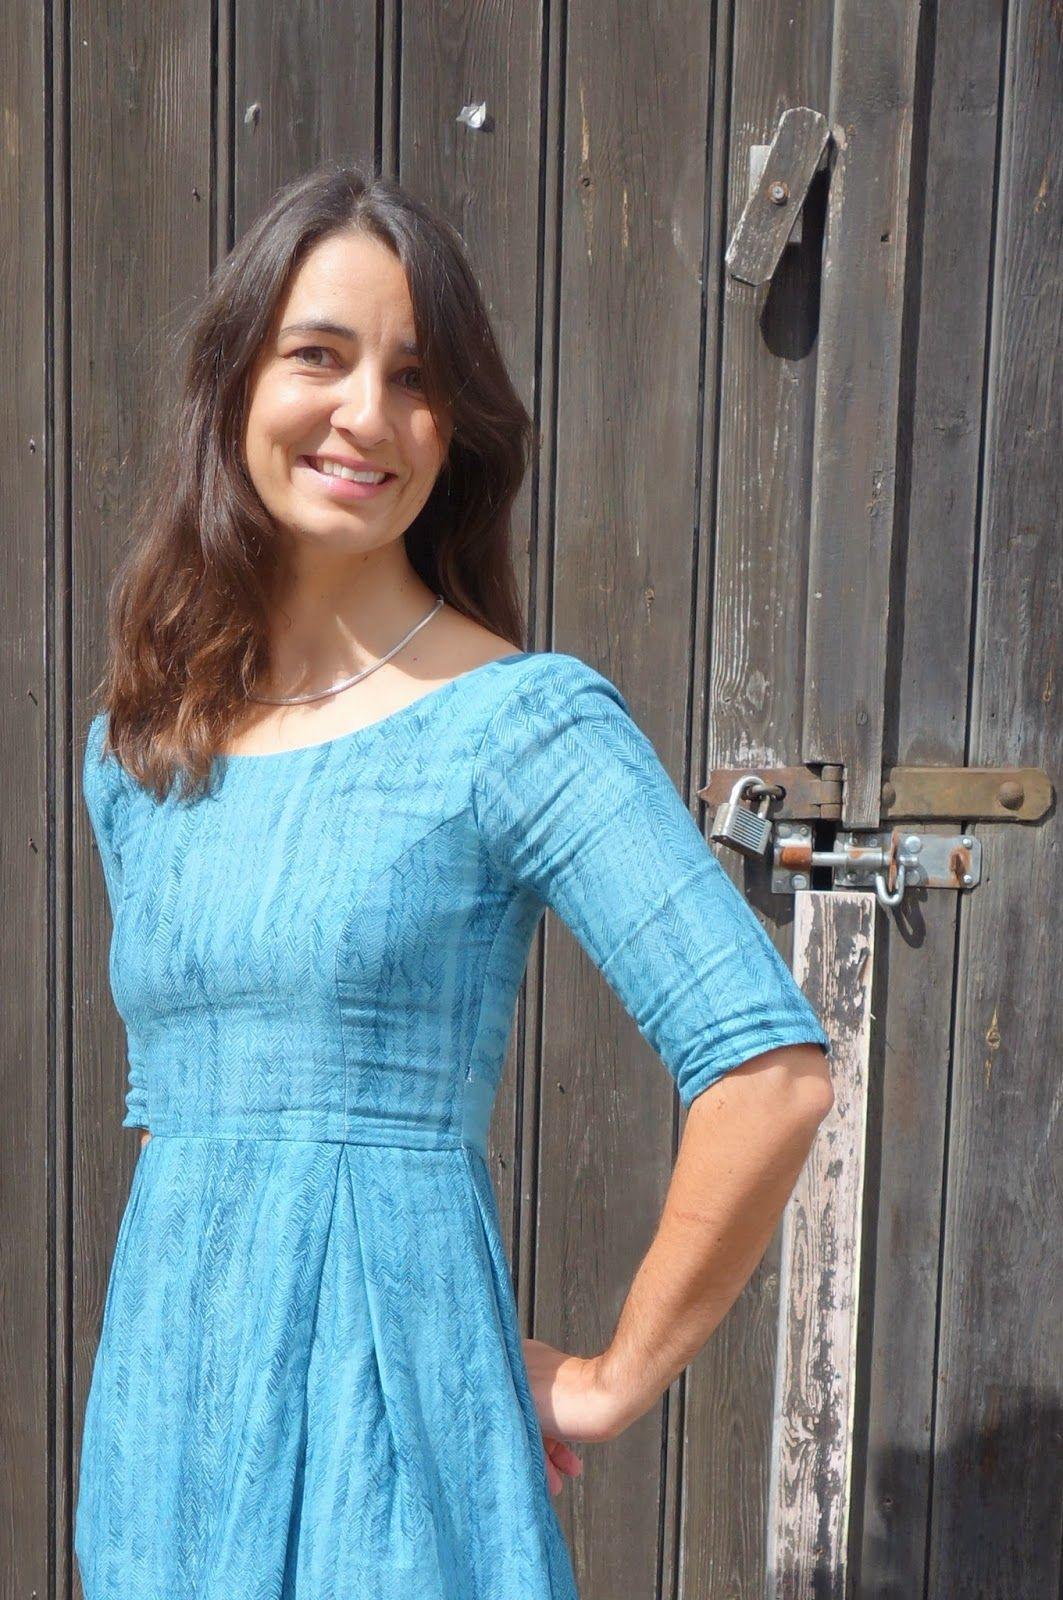 212b00e303c Nani Iro Elisalex Dress - double gauze can work for fitted garments too!